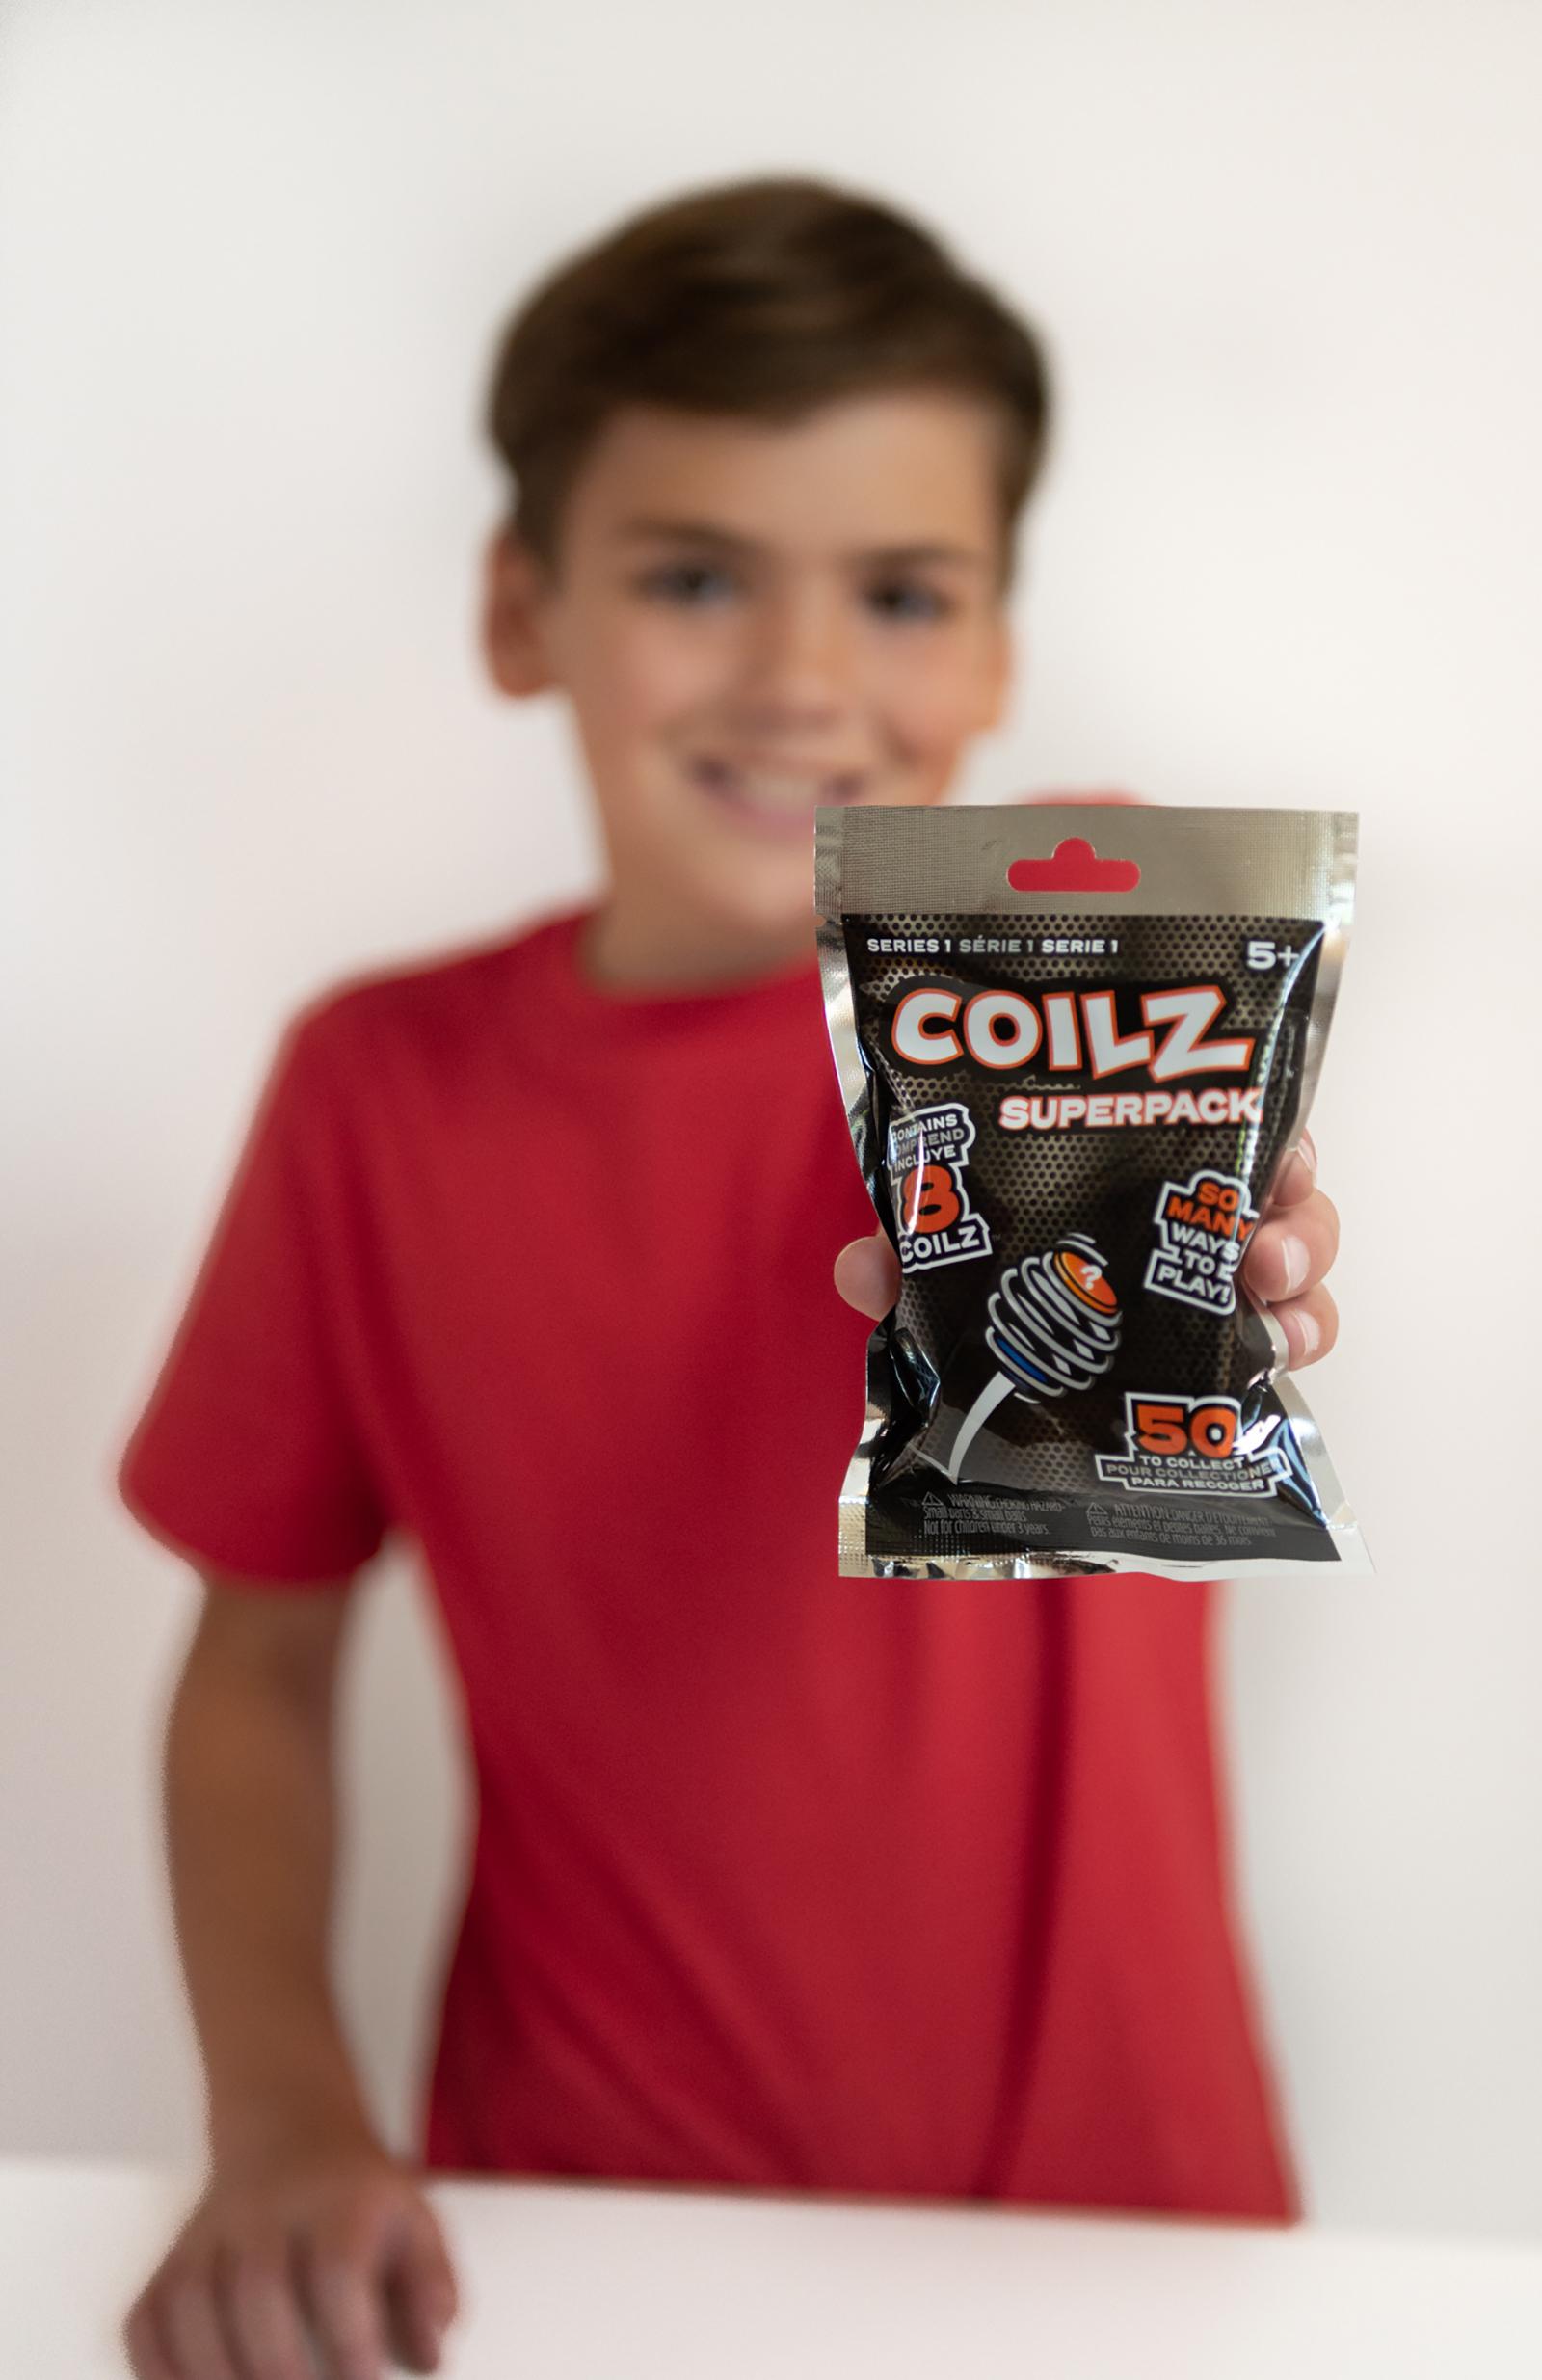 Image 2 Coilz 8-pack with Kid 3 - hi-res.jpg